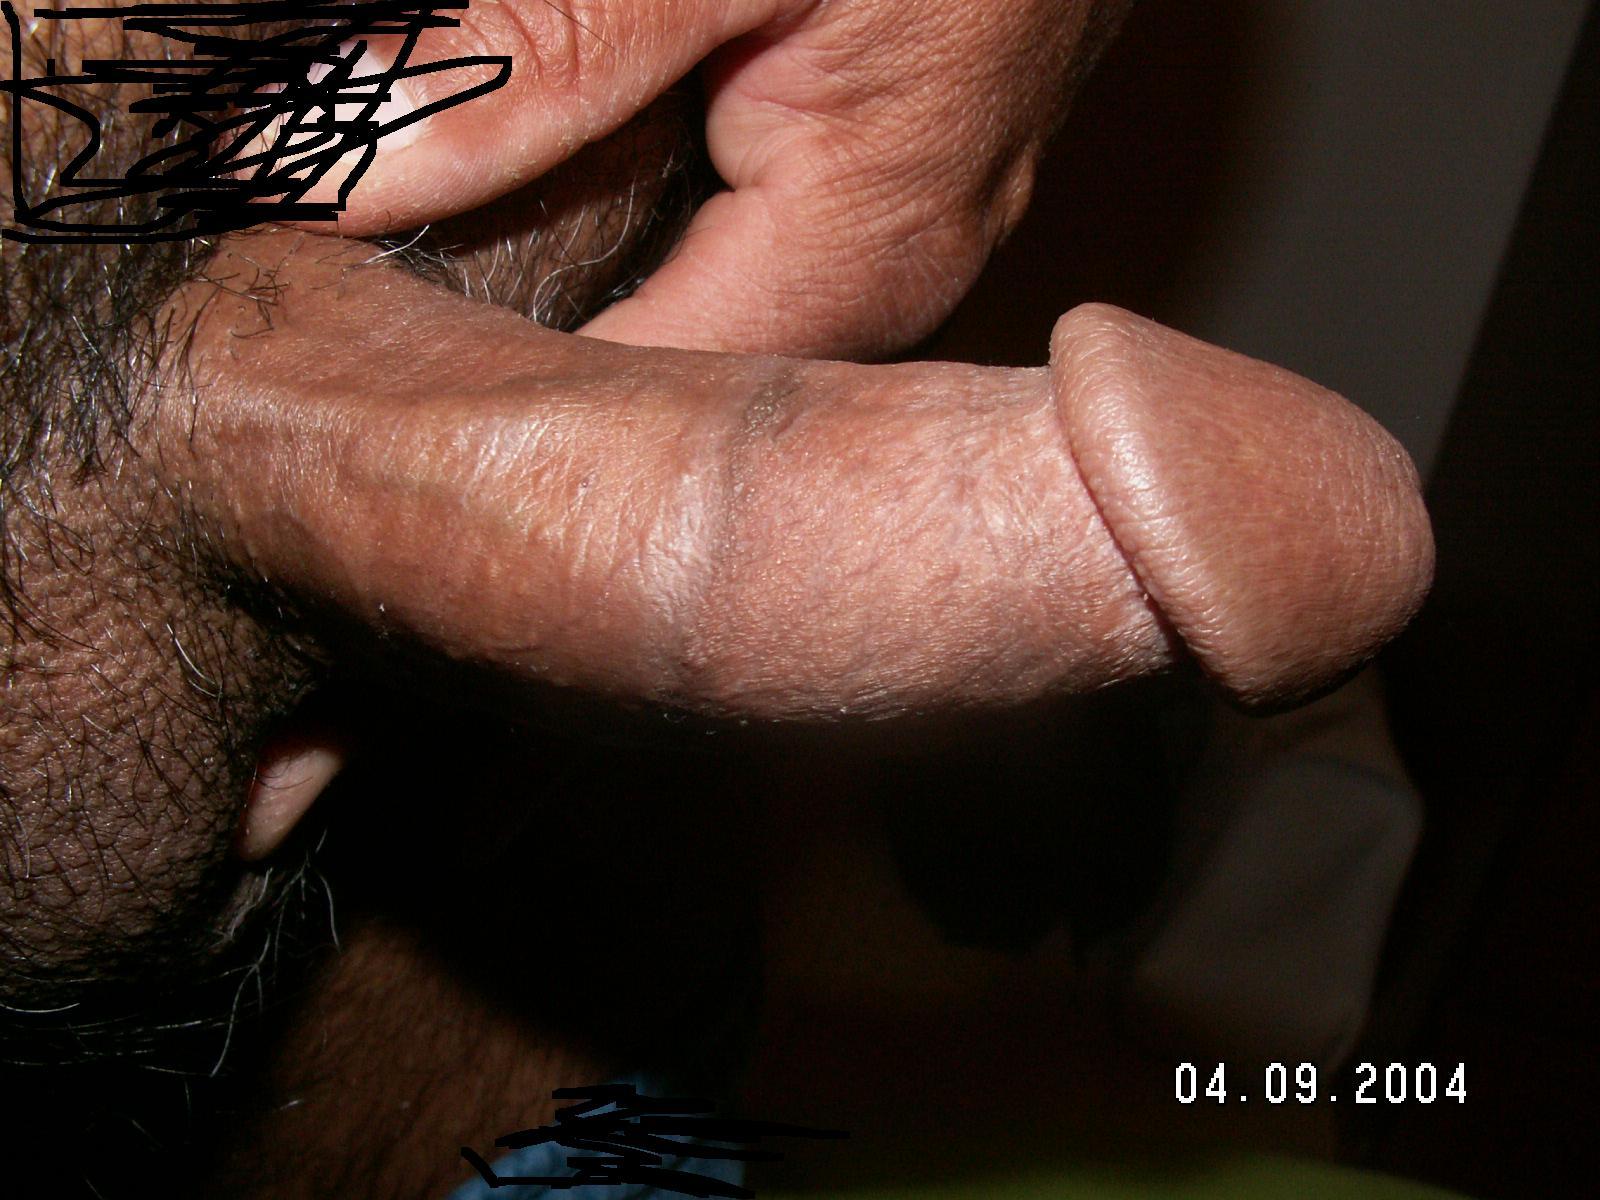 סקס נטקס אתרי סקס חינם